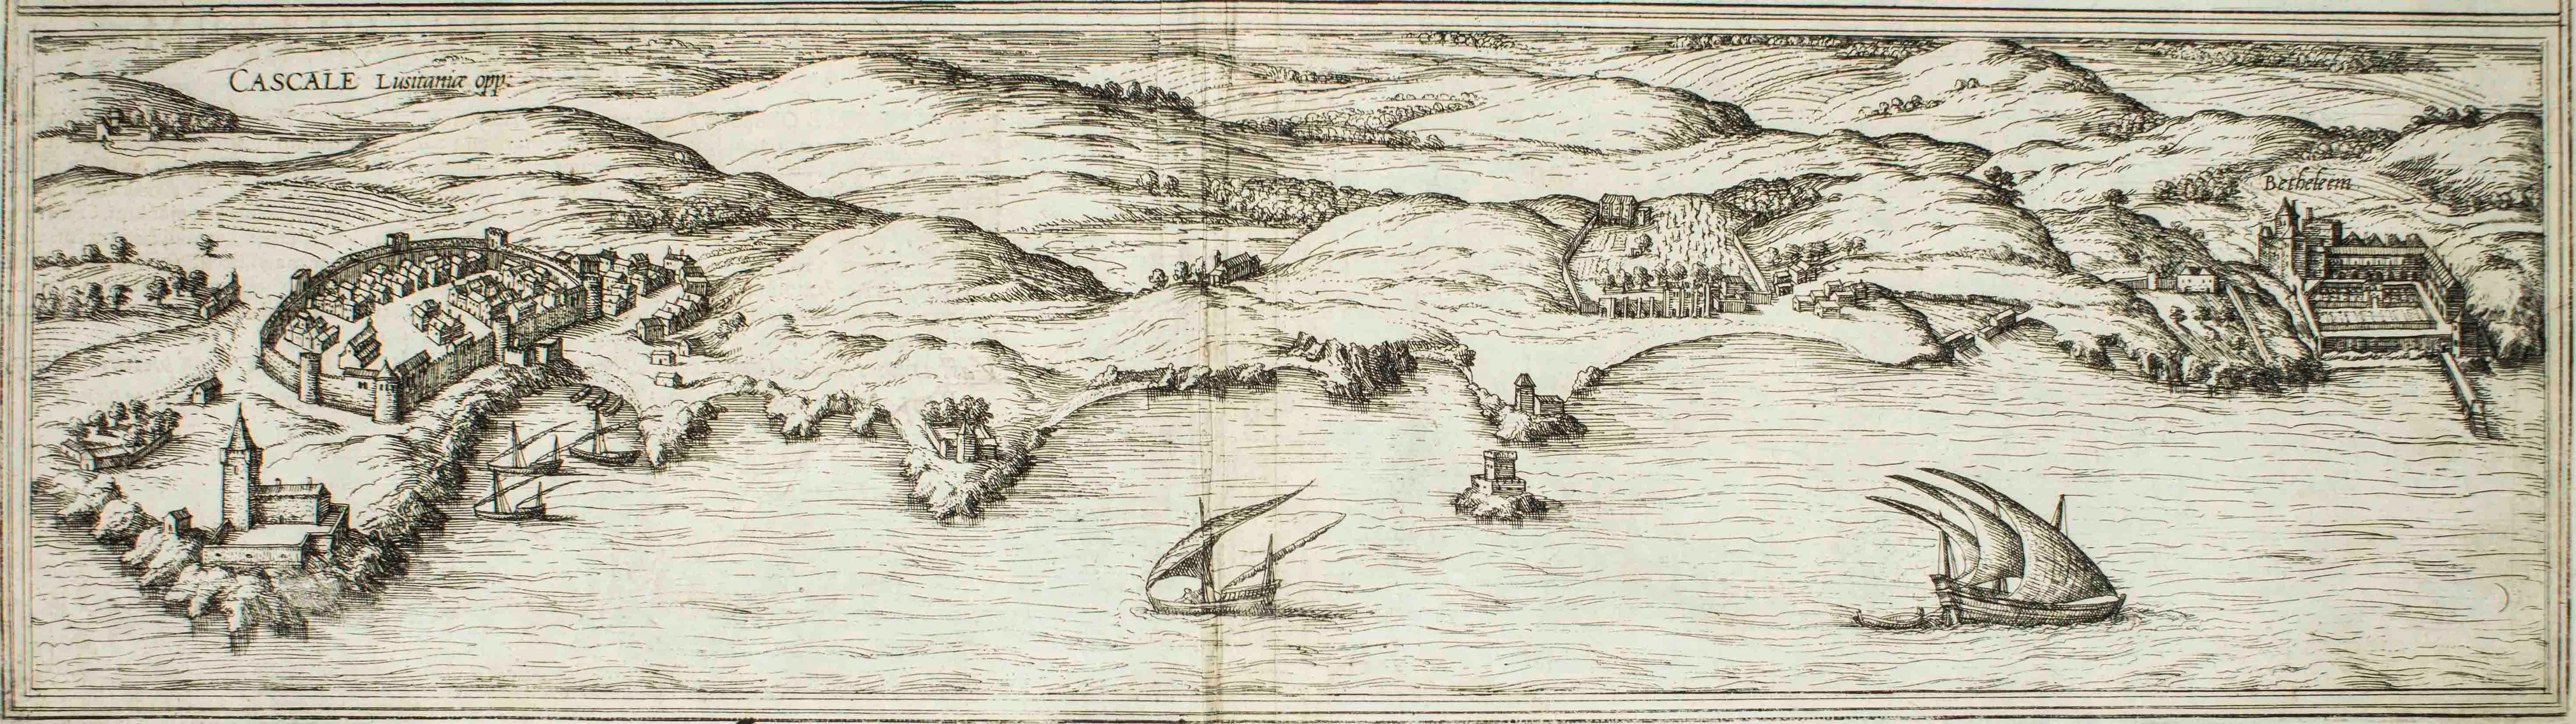 "Cascale, Map from ""Civitates Orbis Terrarum"" - by F. Hogenberg - 1575"